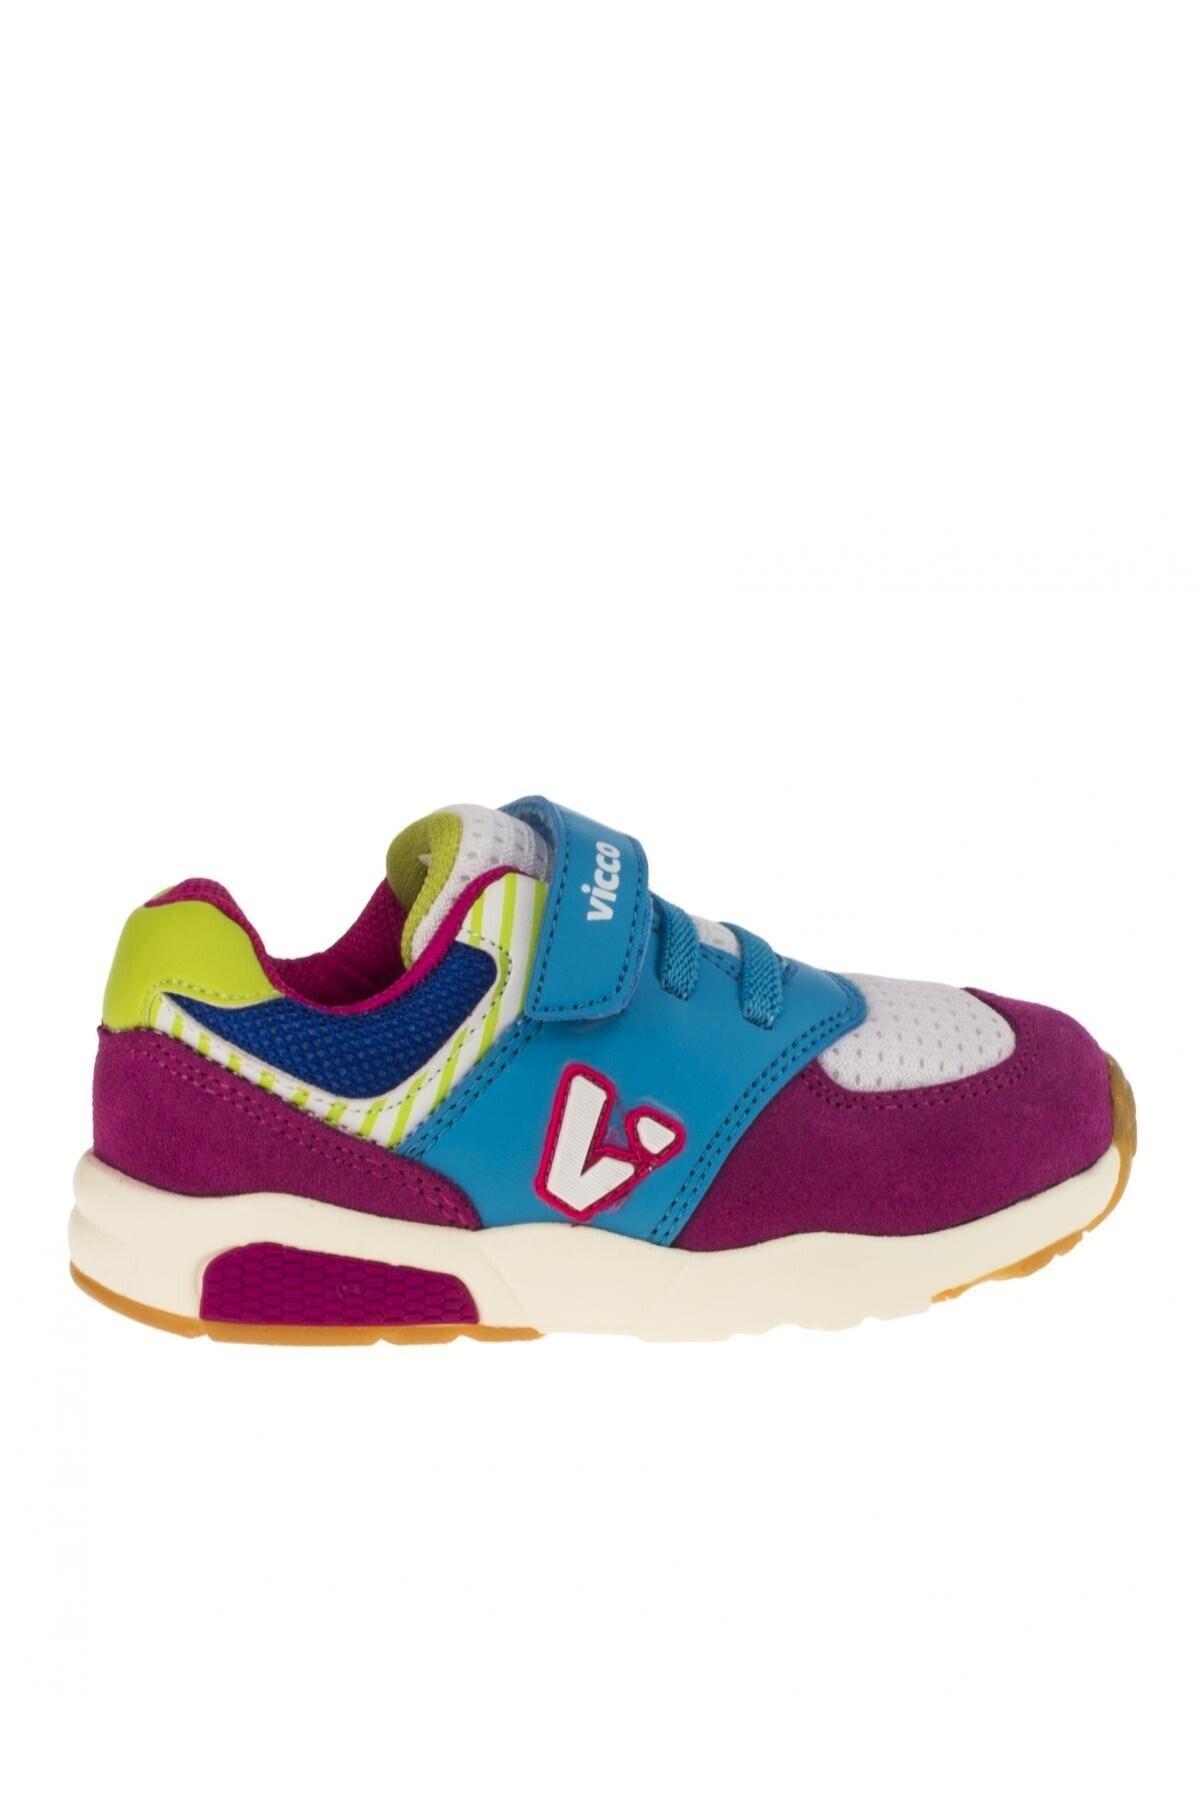 Vicco Erkek Çocuk Mavi-Pembe Ayakkabı 211 34718y152p Sneaker 2